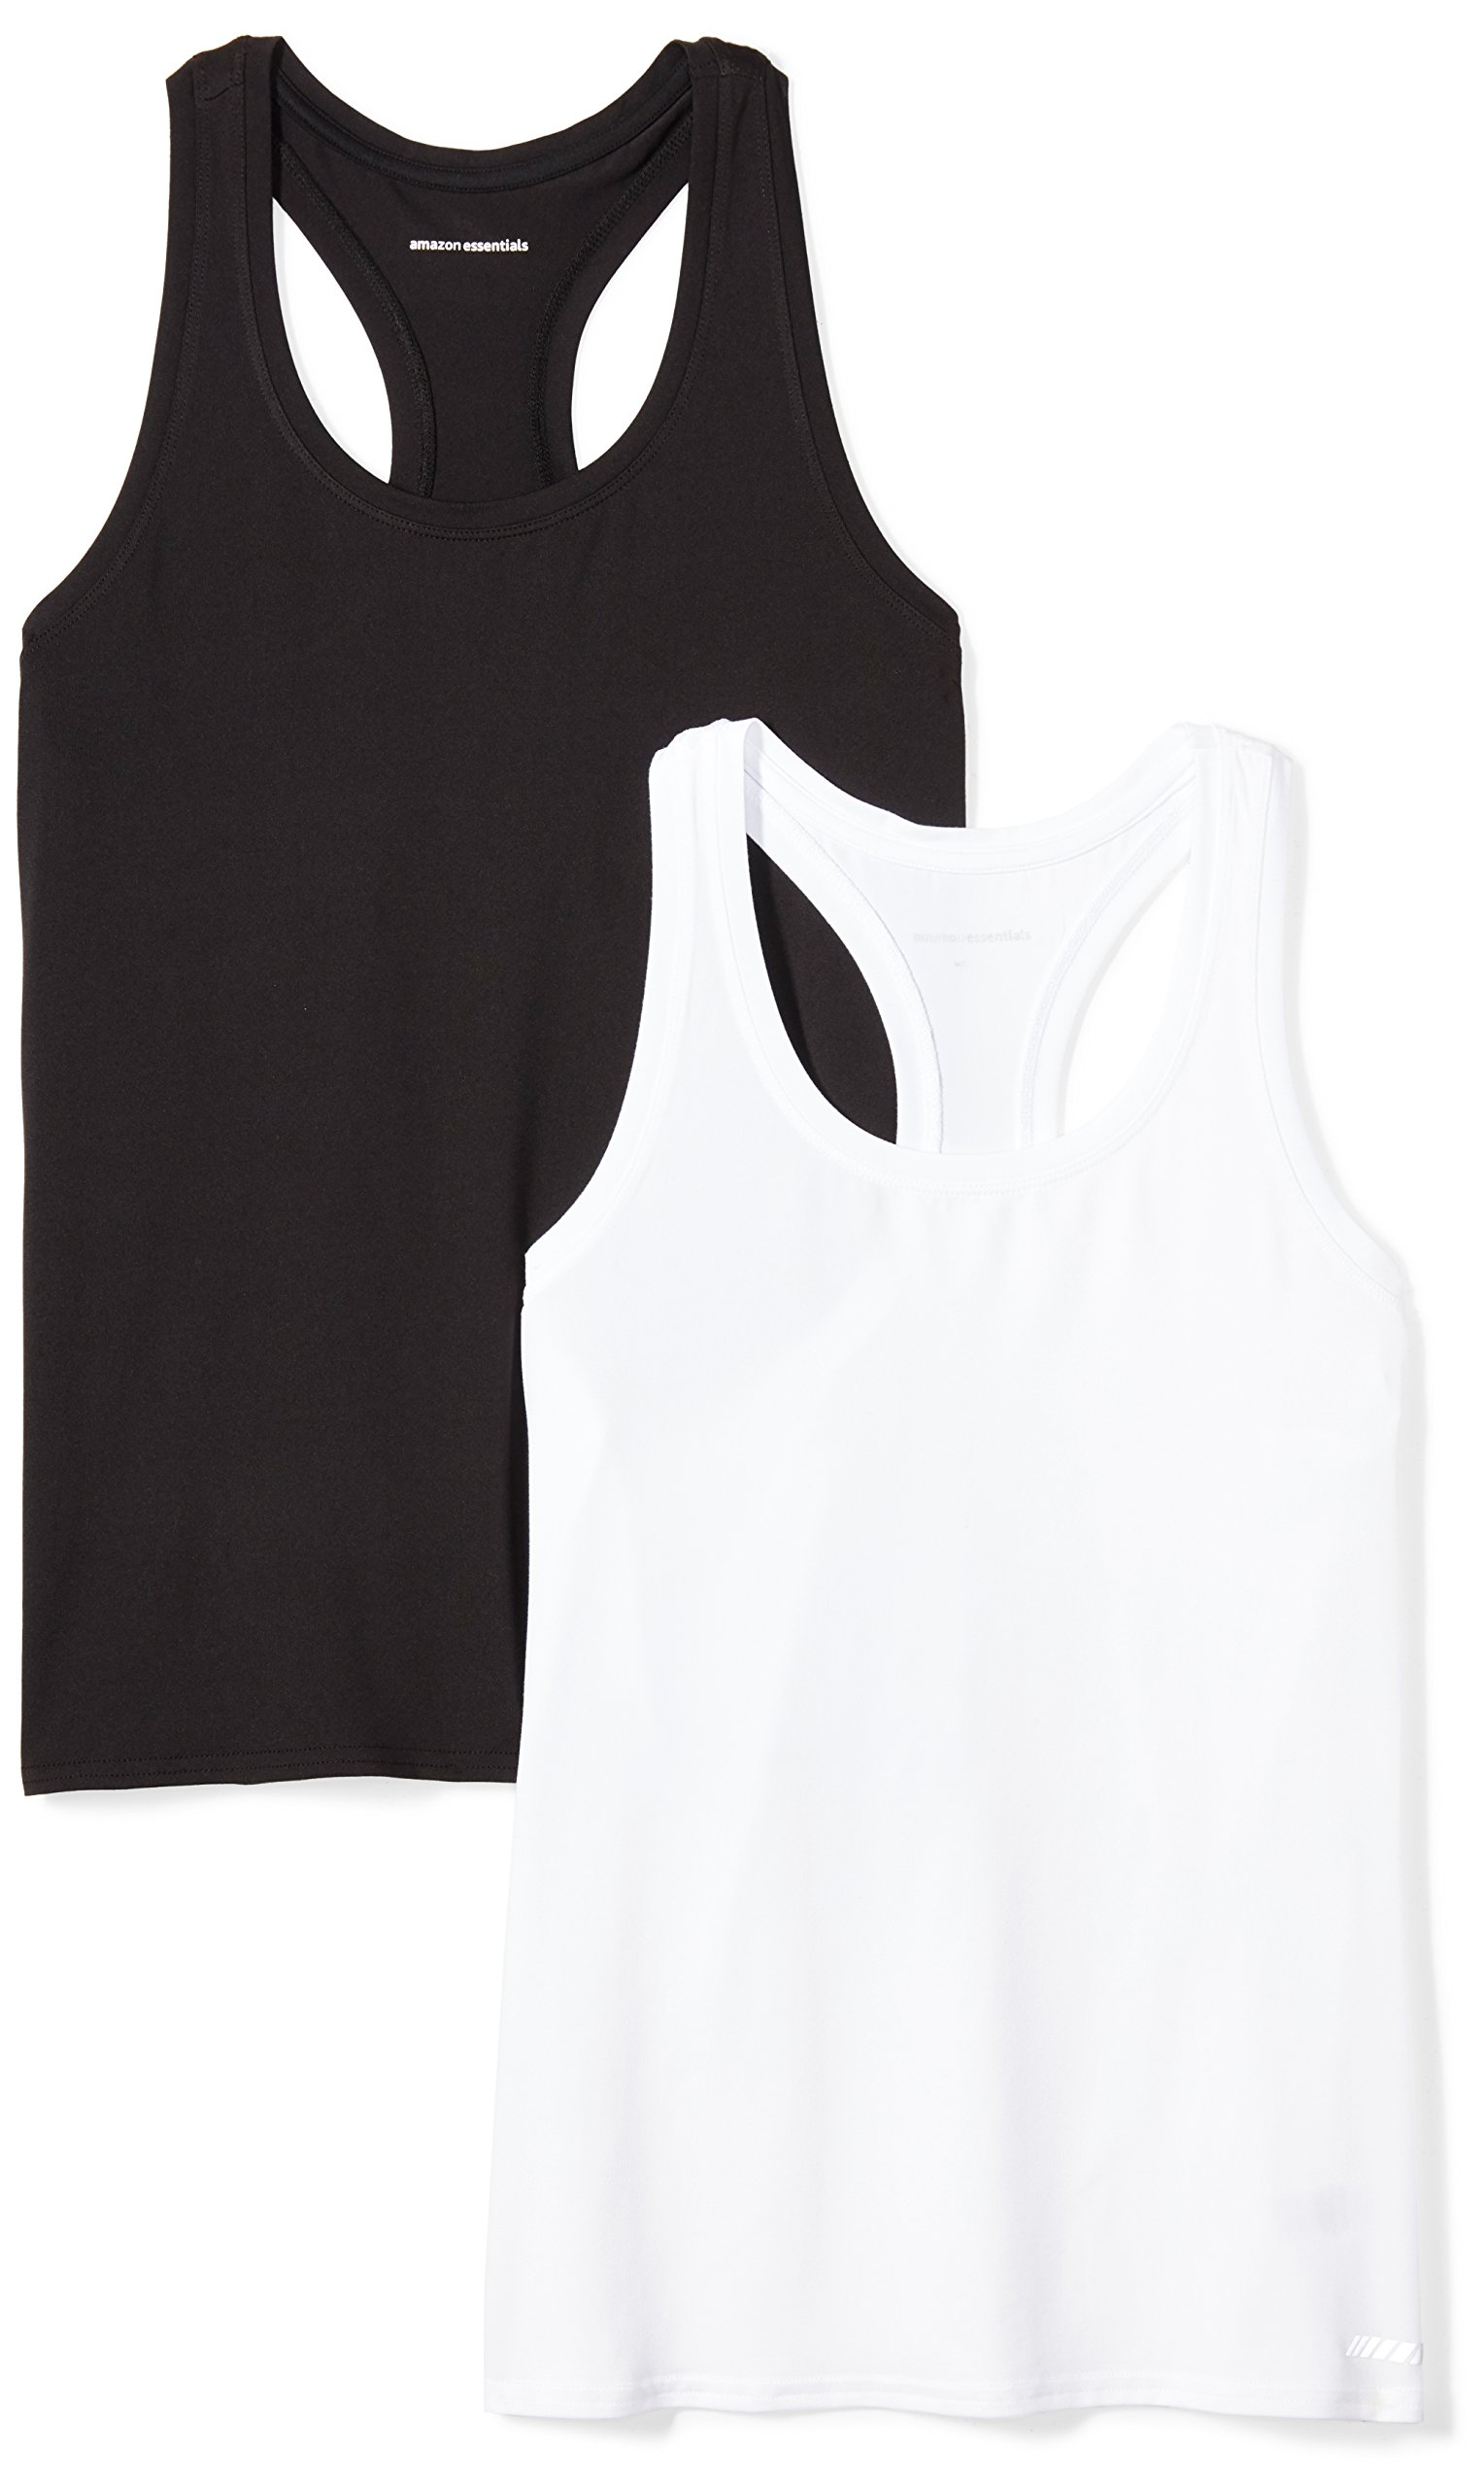 Amazon Essentials Women's Standard 2-Pack Tech Stretch Racerback Tank Top, Black/White, Medium